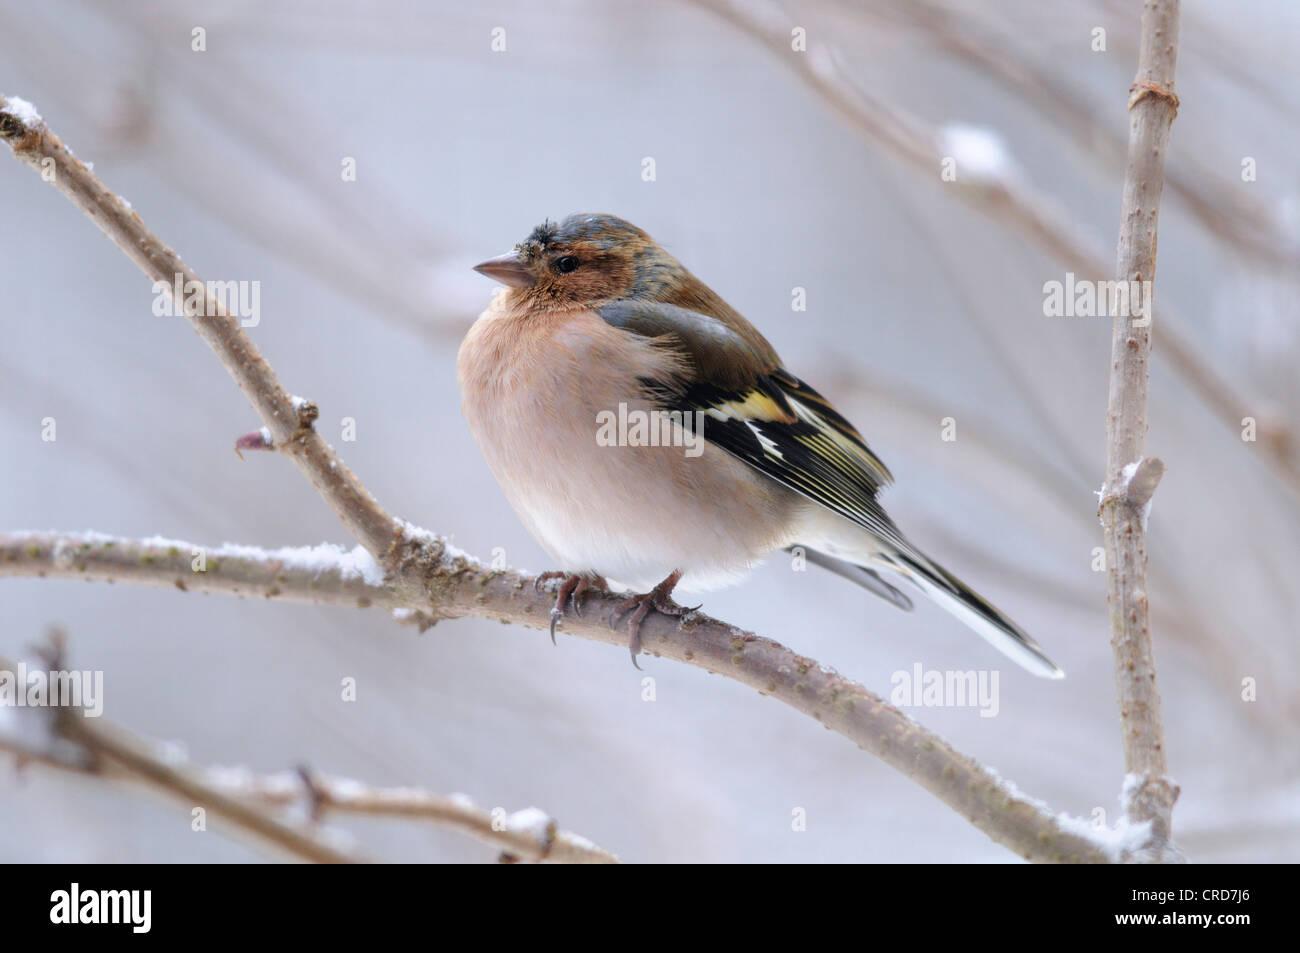 Chaffinch (Fringilla coelebs) perching on branch - Stock Image